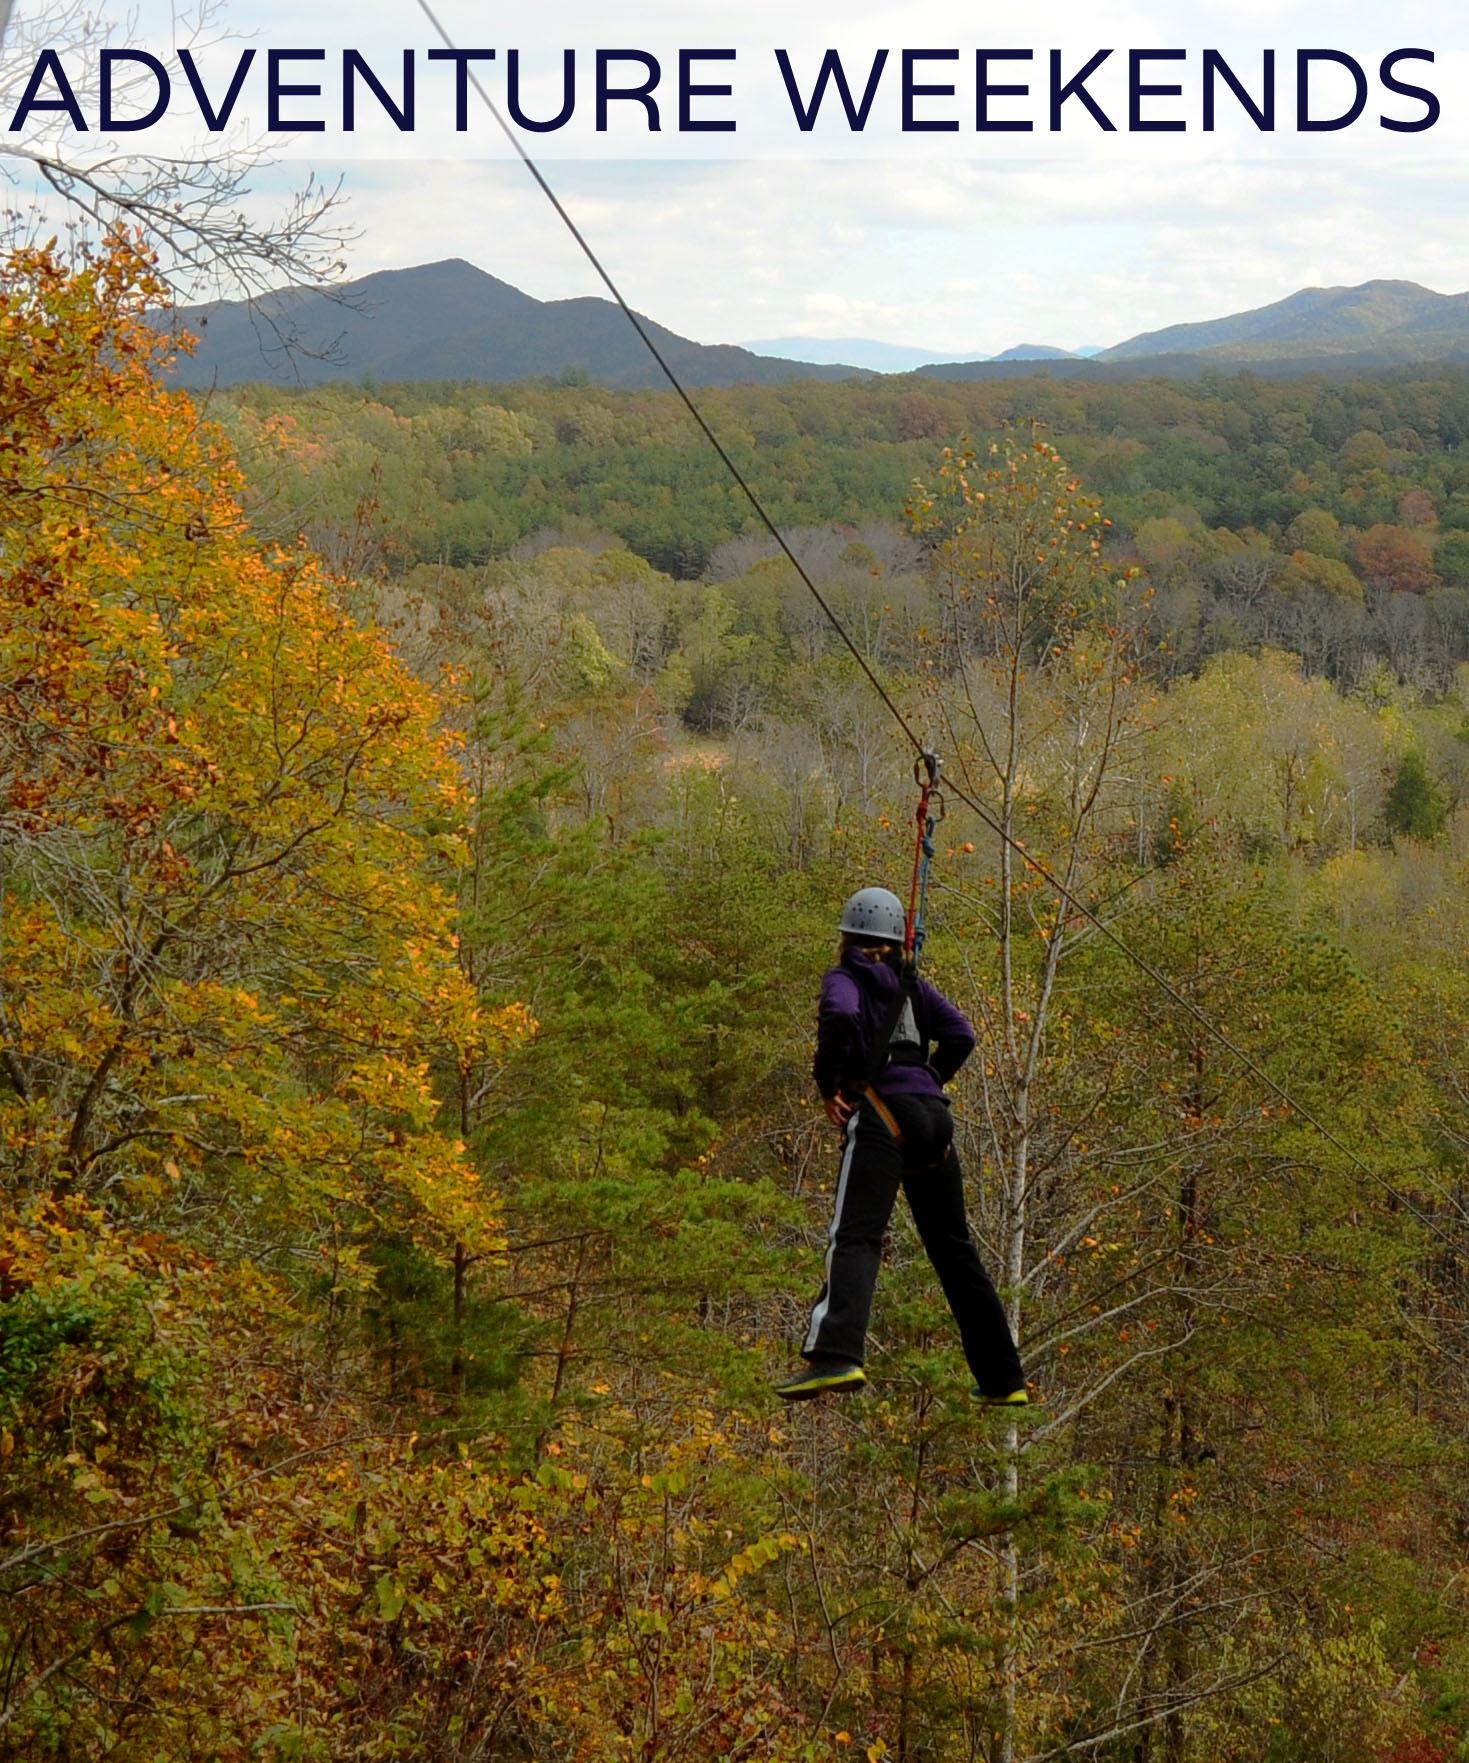 Adventure Activities for small groups: zip line, climbing wall, canoe/tube/bike rentals.